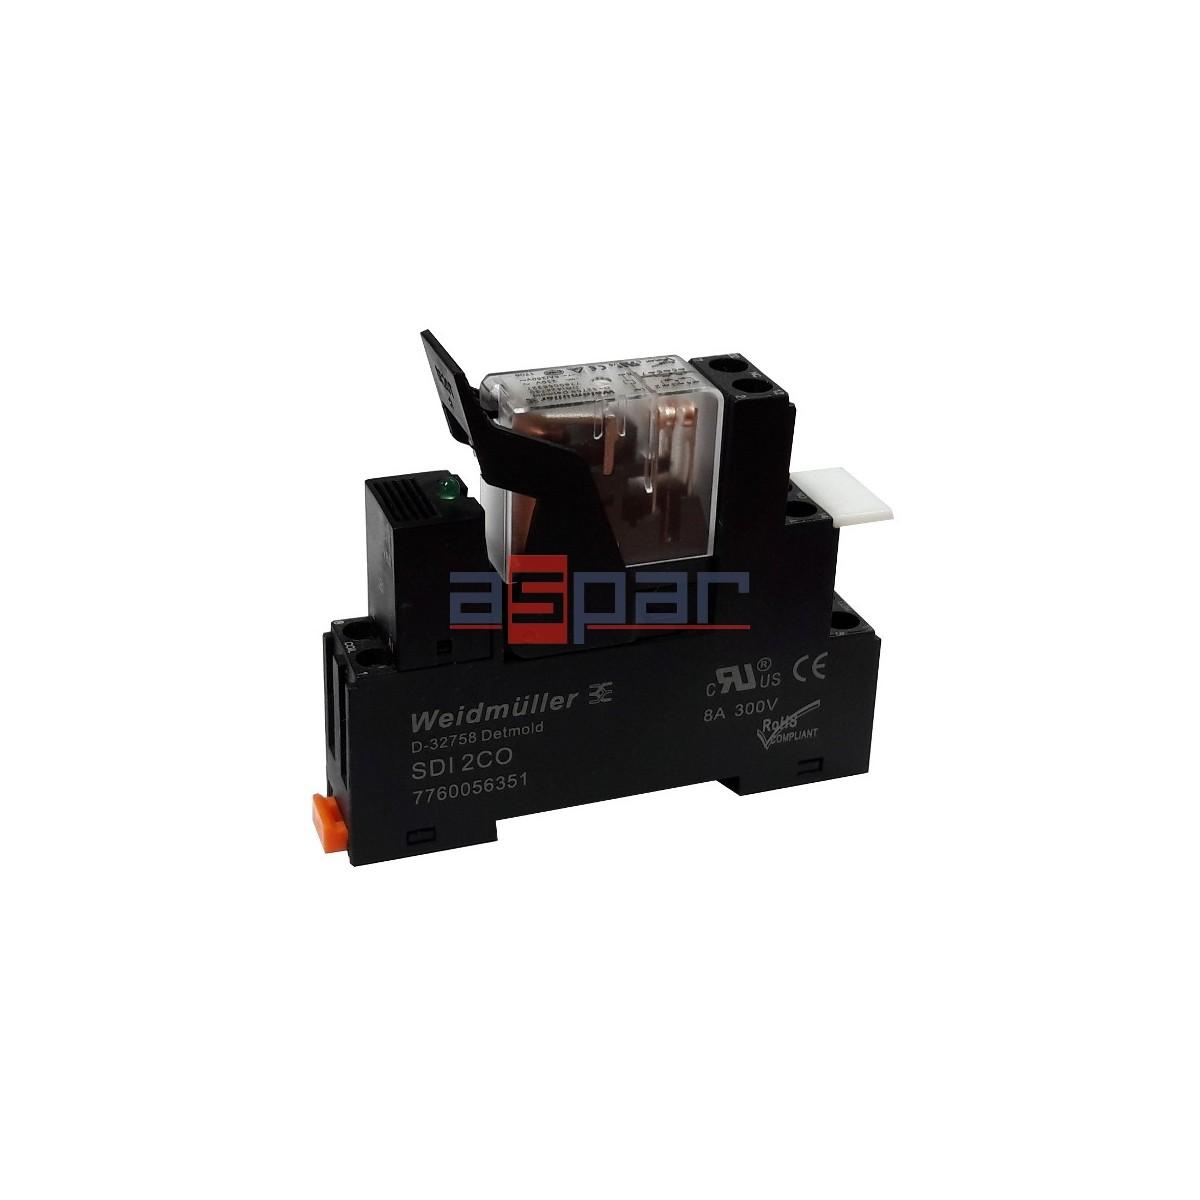 Przekaźnik kompletny, ZEST-DRI-230AC-2CO-5A-LED